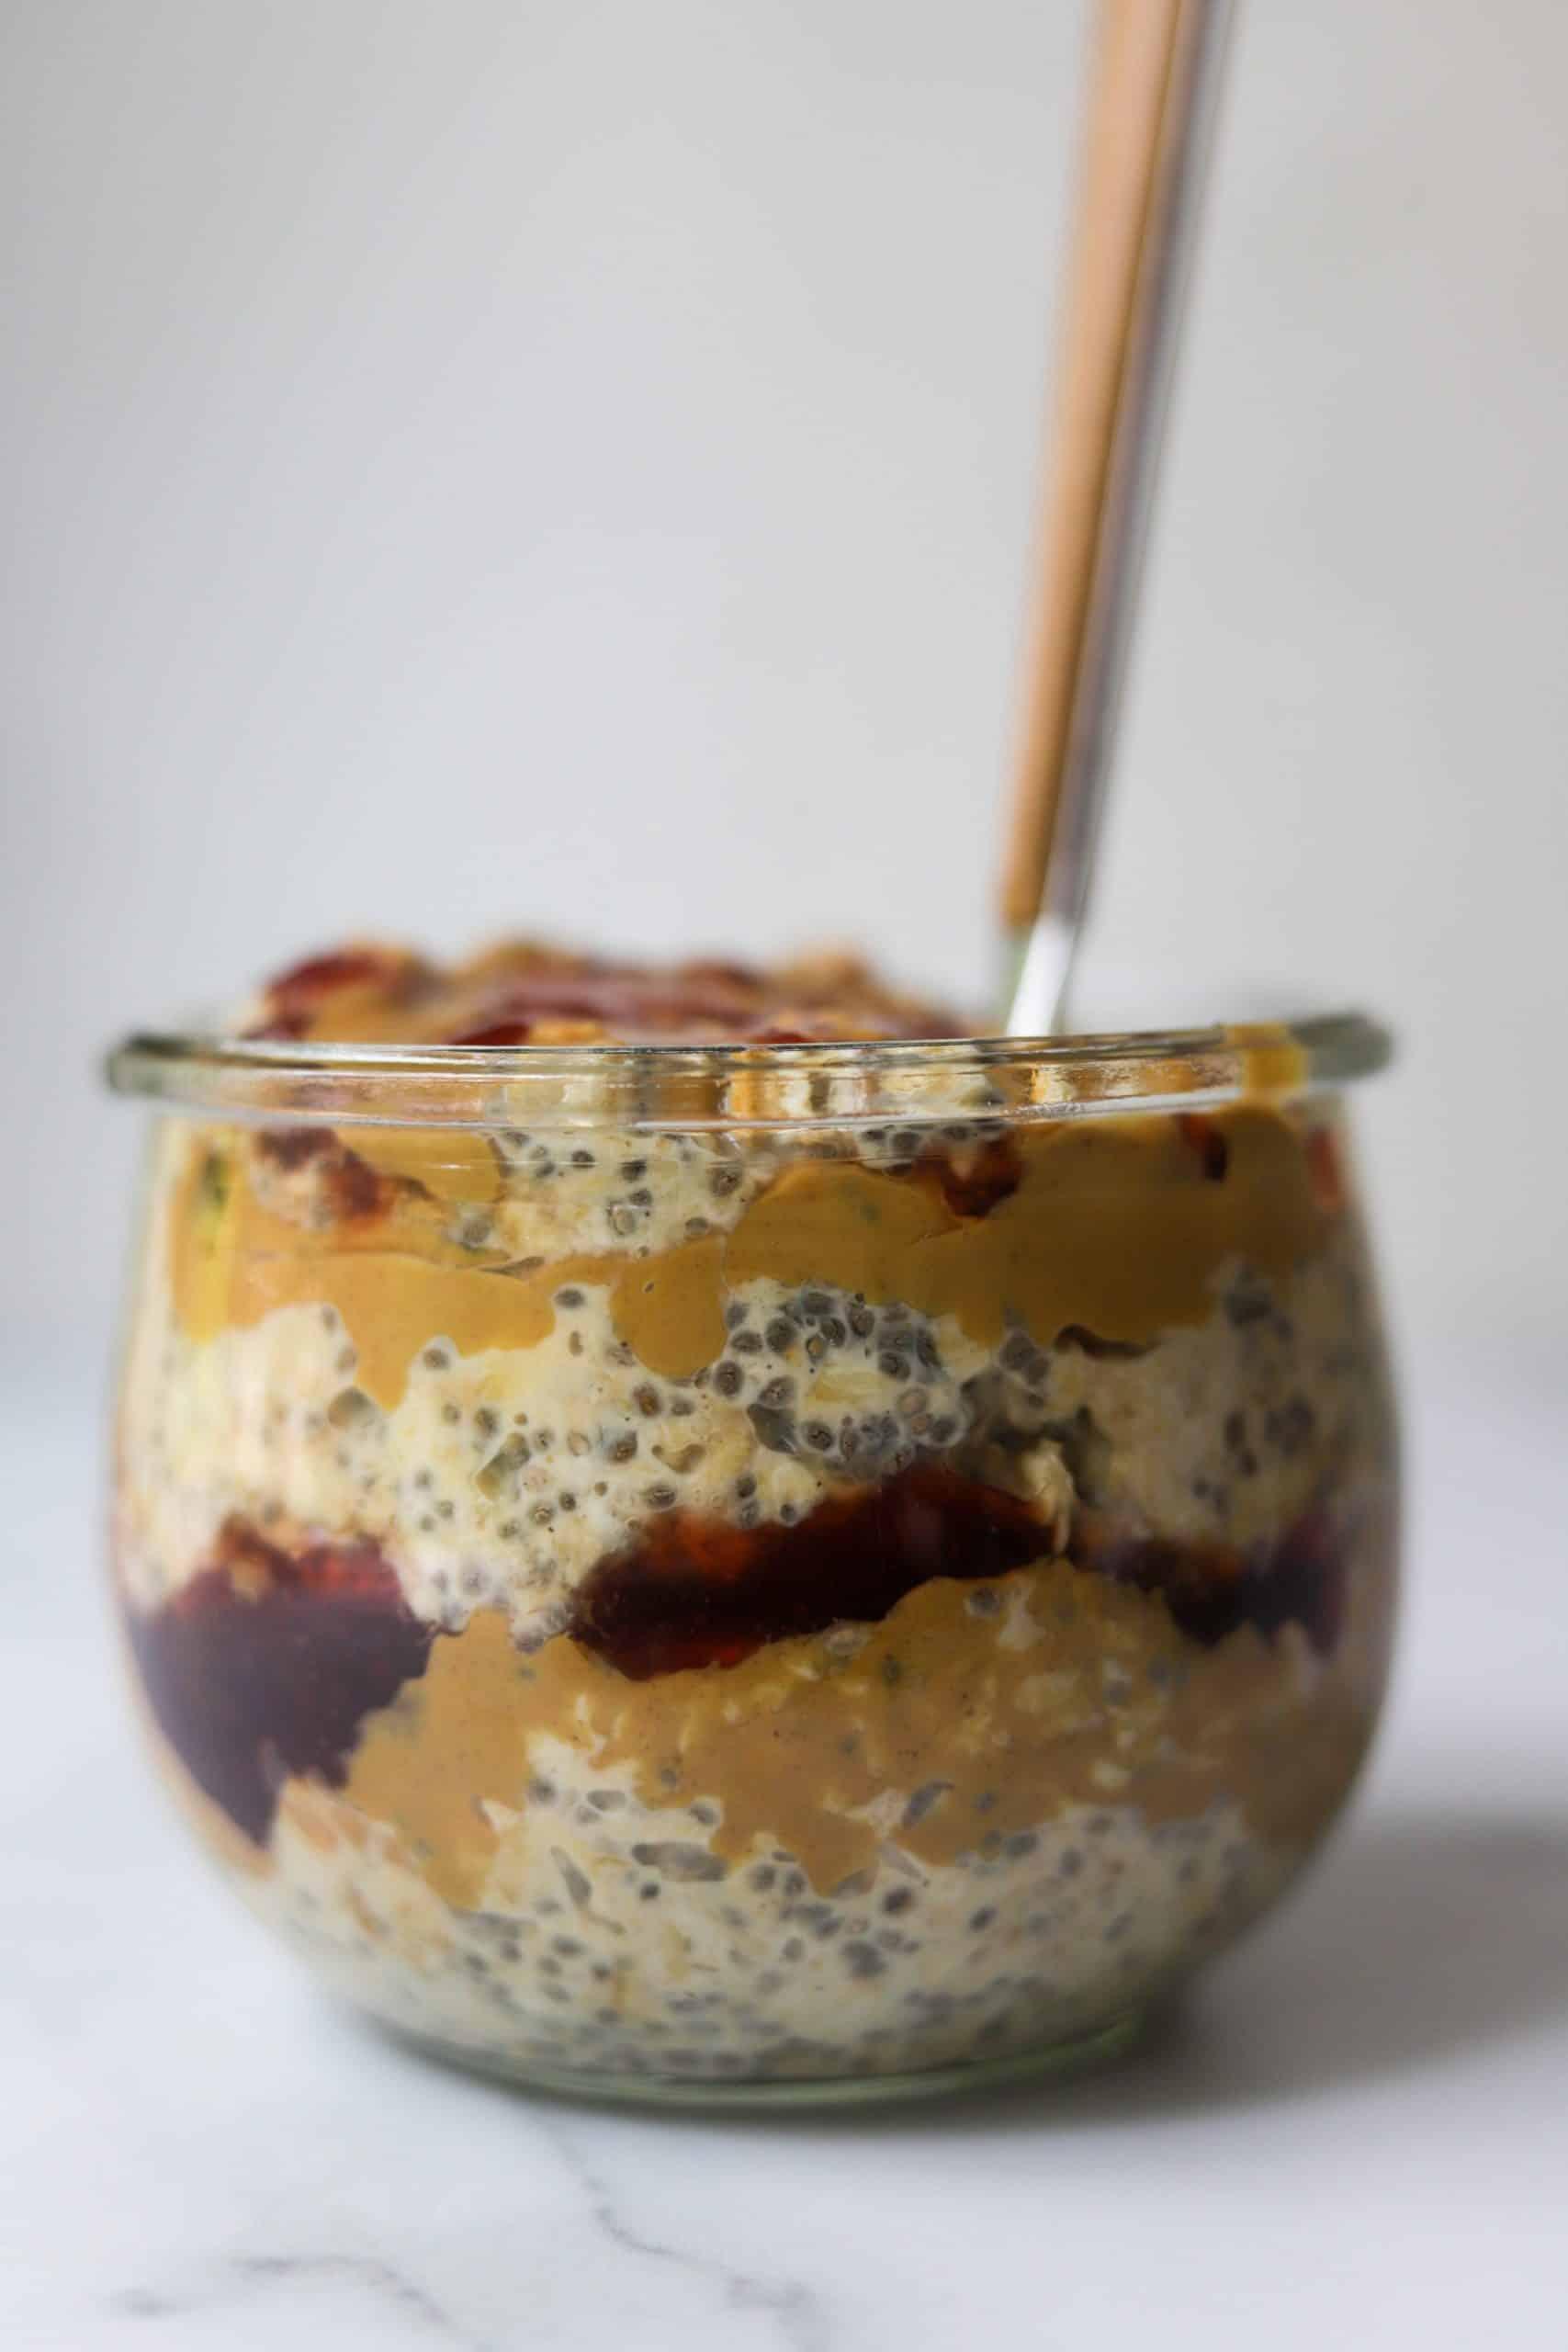 A side shot of a jar of PB and J oats.